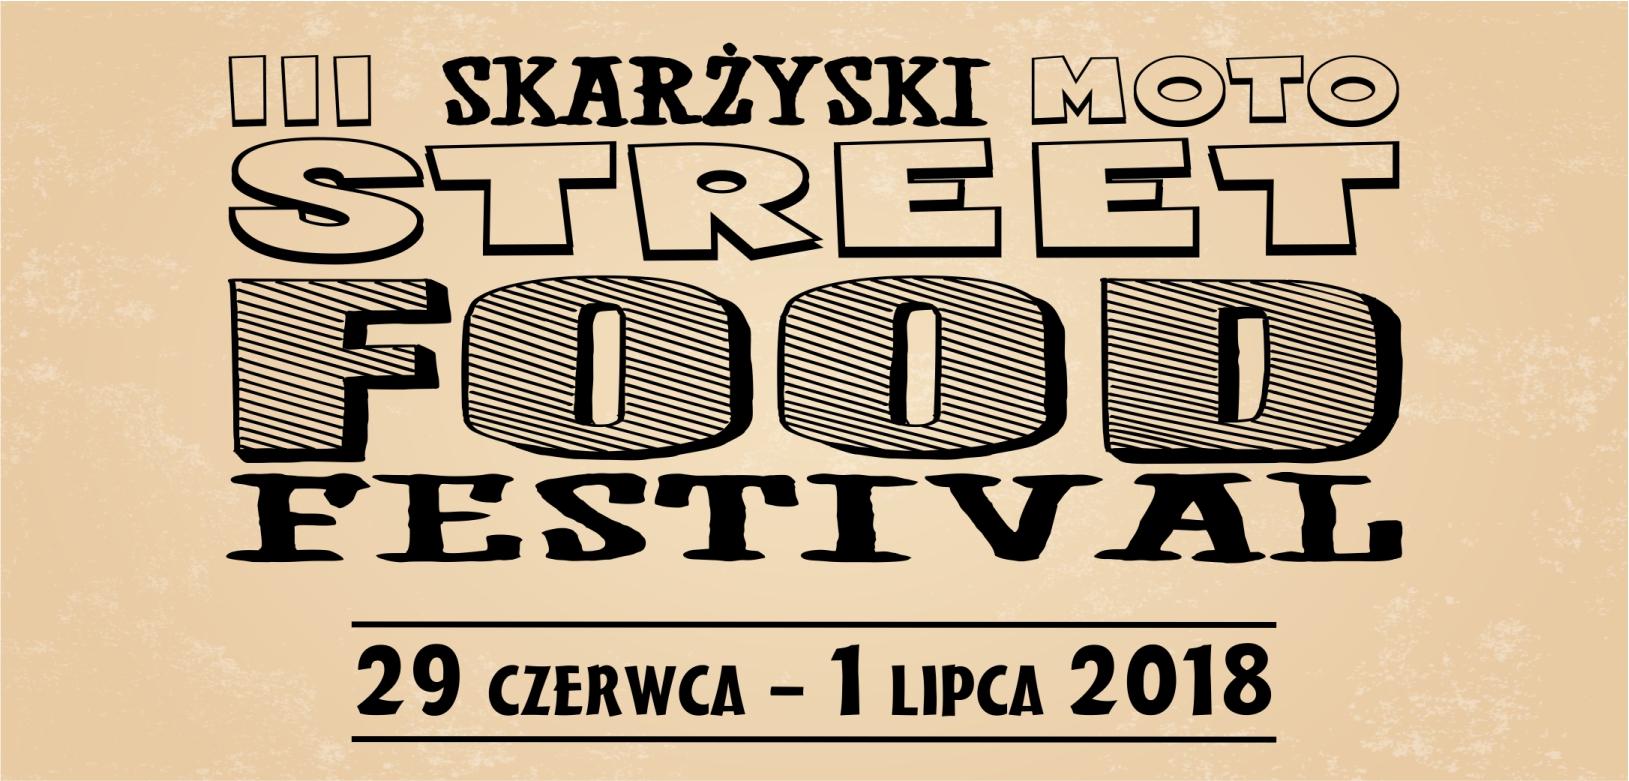 street_food_festiwal_skarzysko_2018_cover